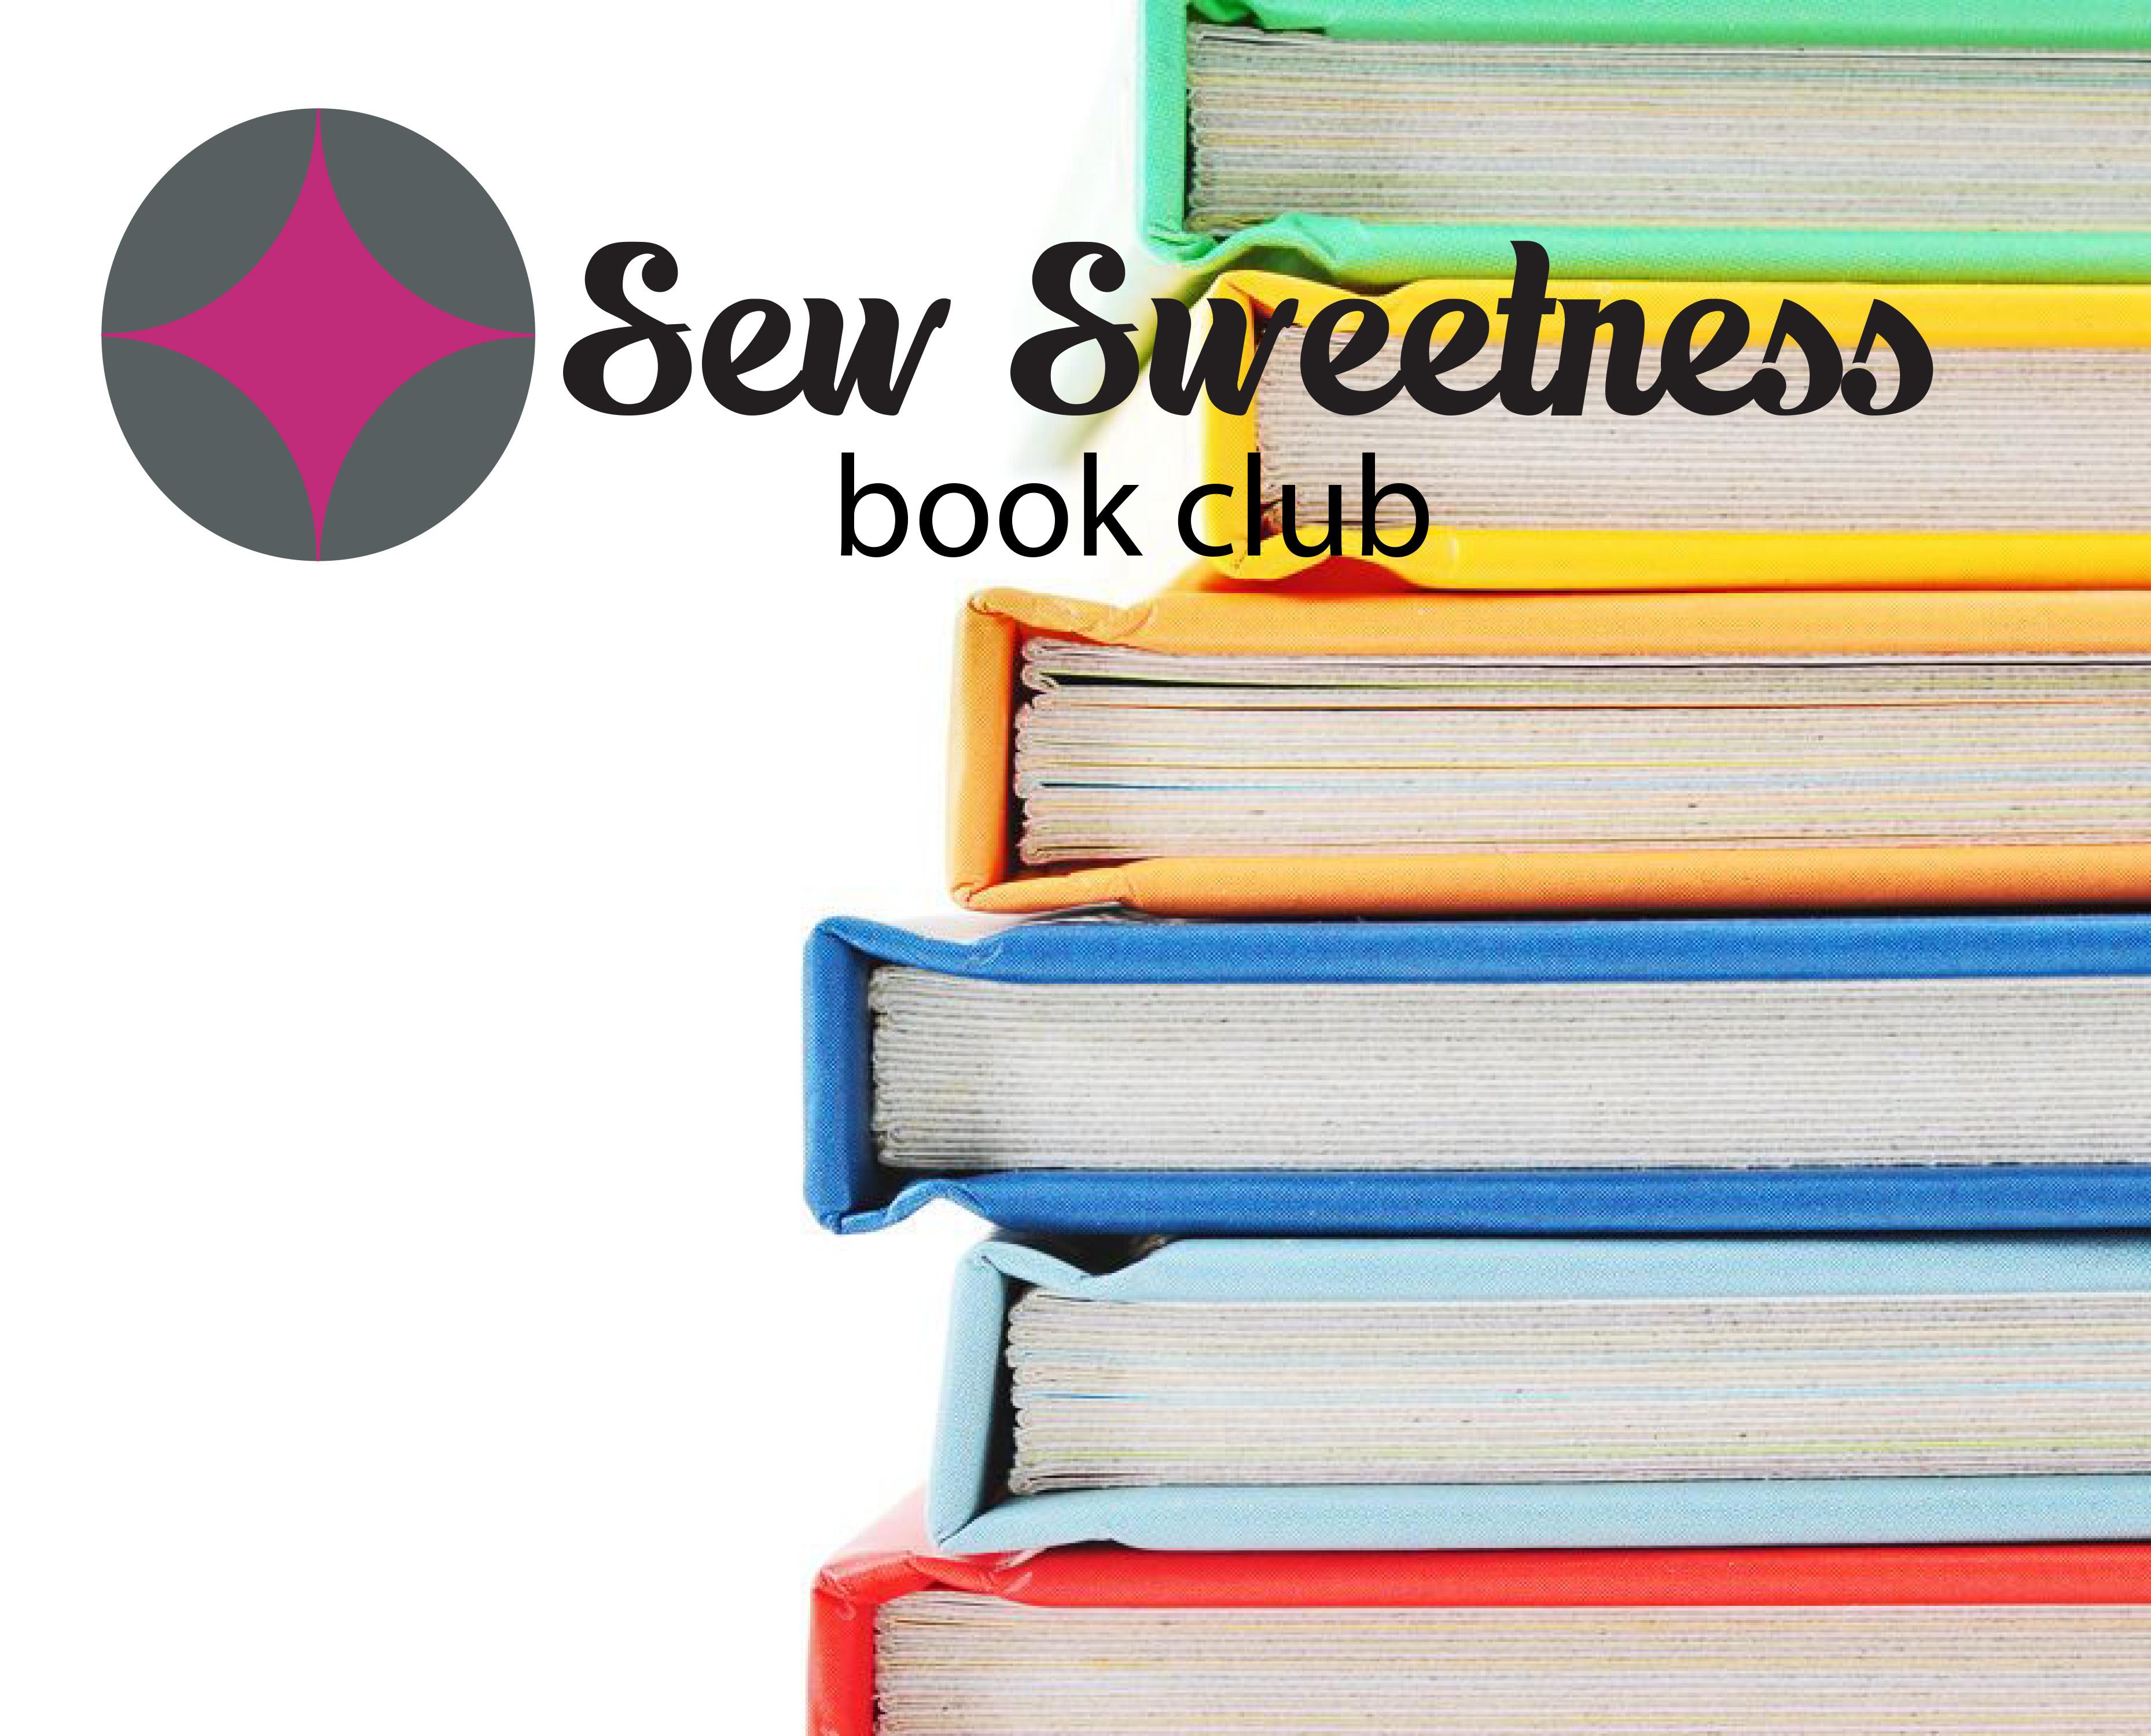 Sew Sweetness Book Club - Sew Sweetness